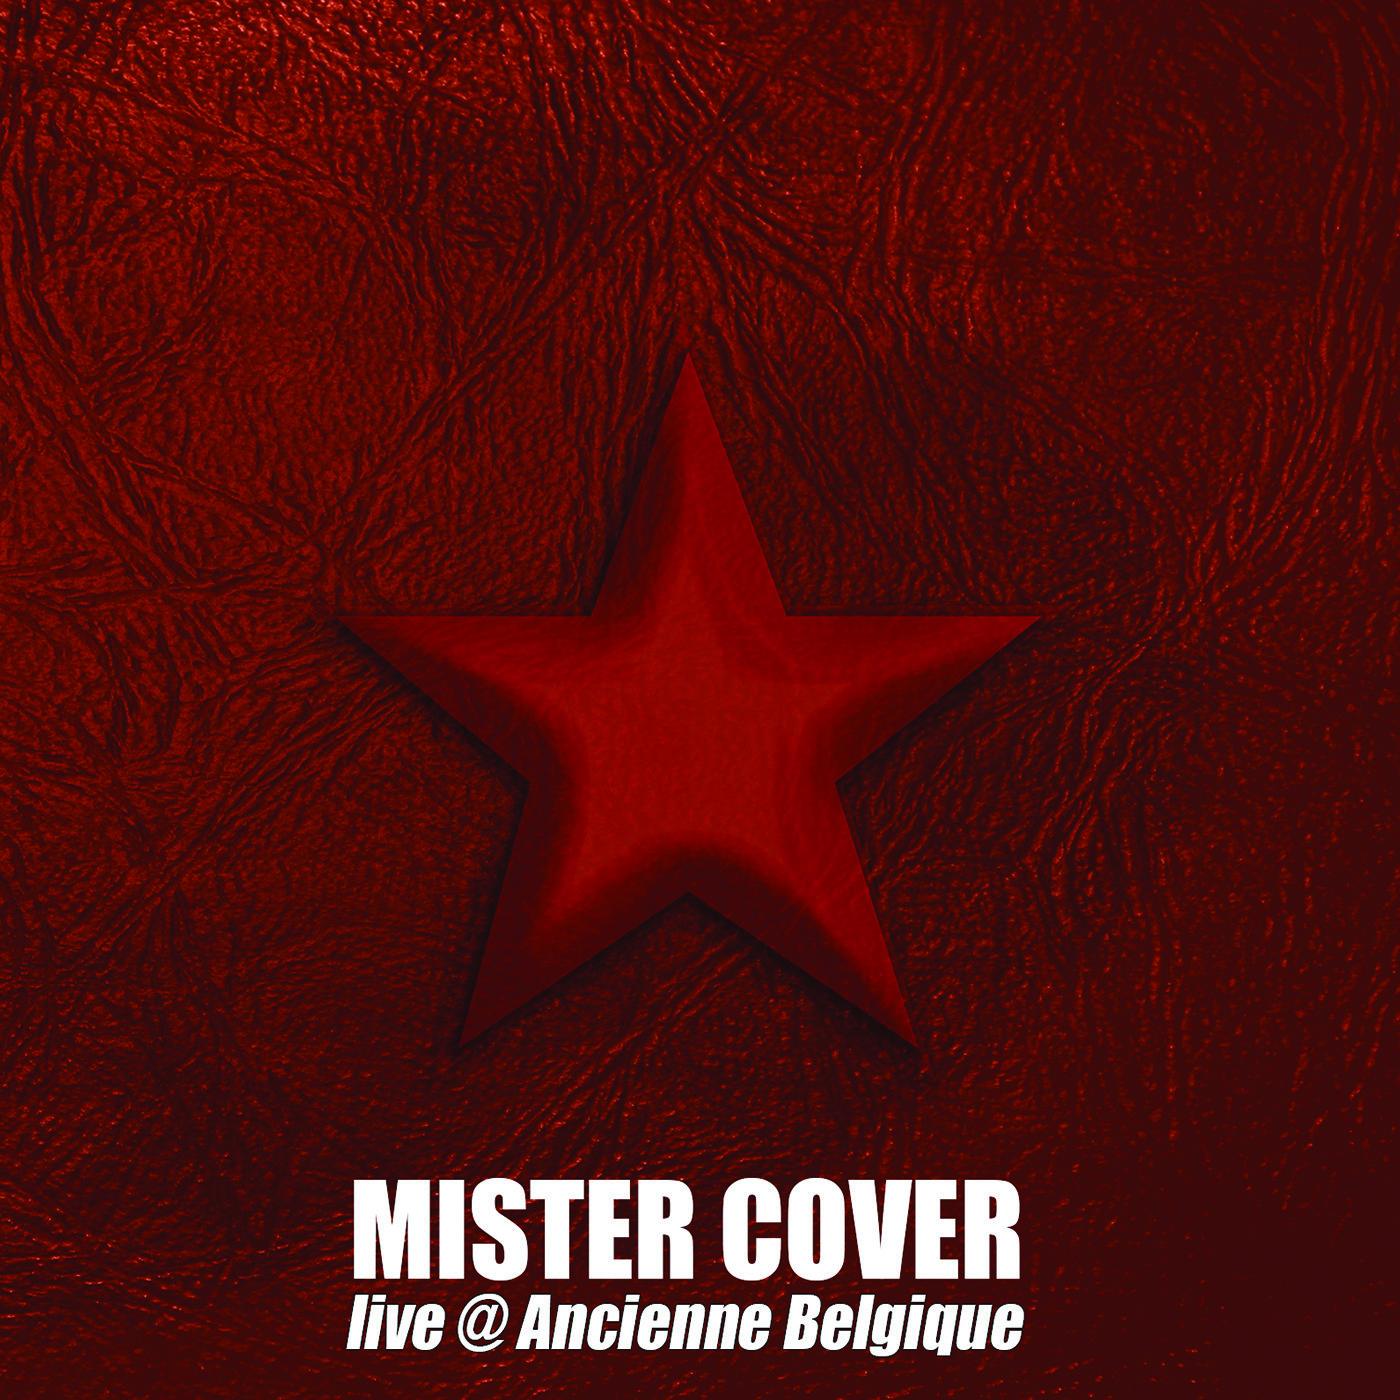 CD Mister Cover Live @ Ancienne Belgique